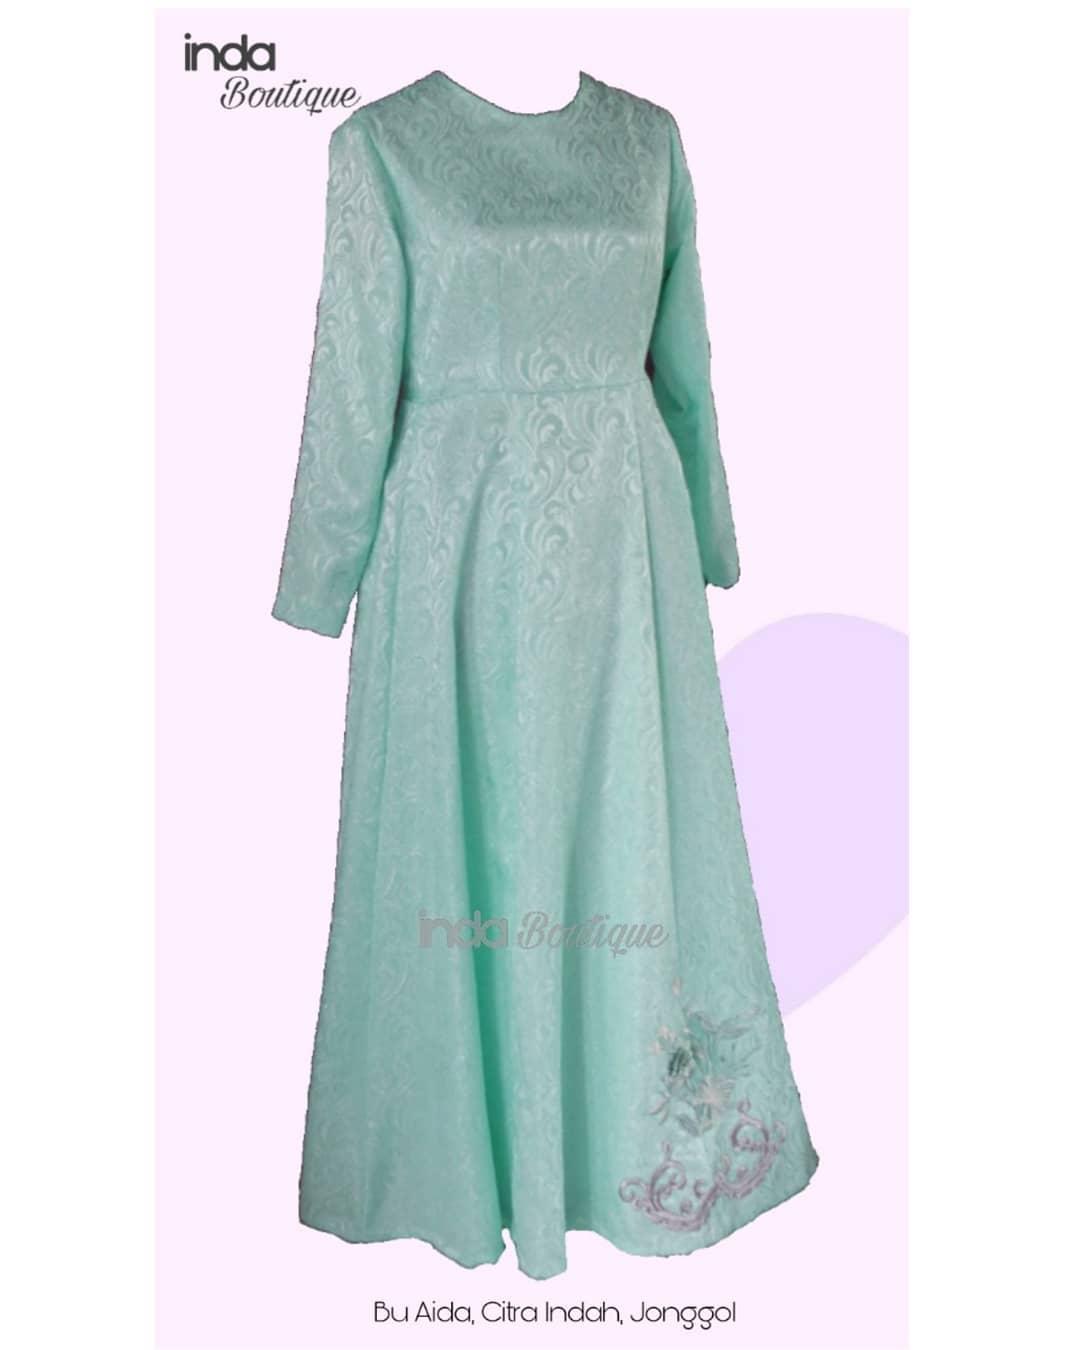 Gaun Cantik untuk Ibu Aida di Citra Indah, Jonggol by Indabutik